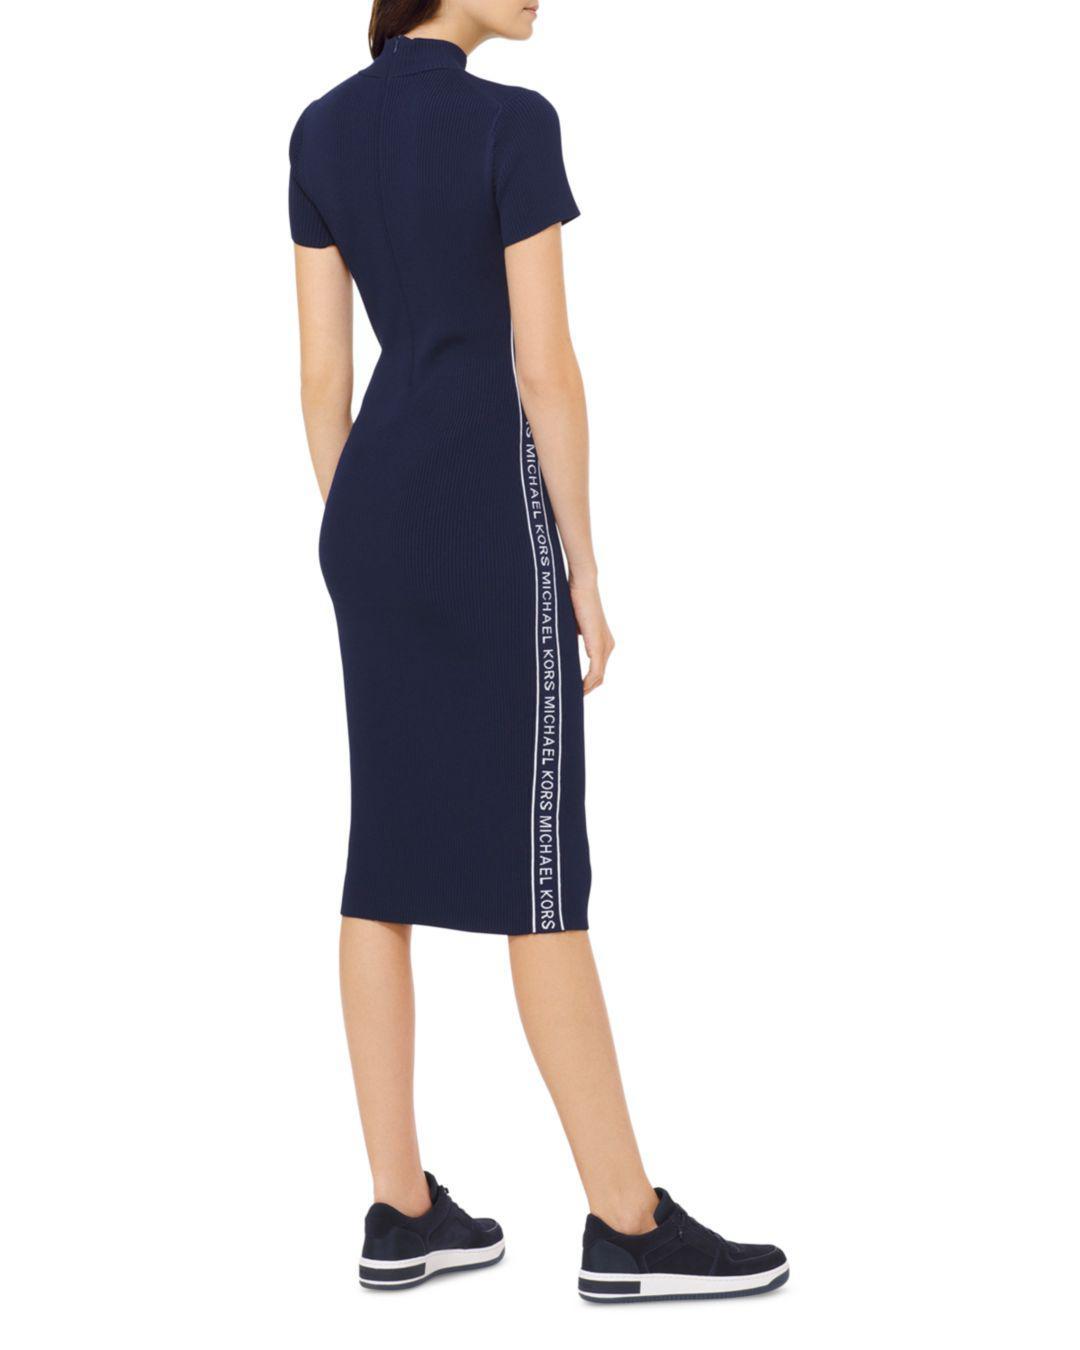 cc44e98df56 MICHAEL Michael Kors Logo Tape Ribbed Knit Dress in Blue - Lyst